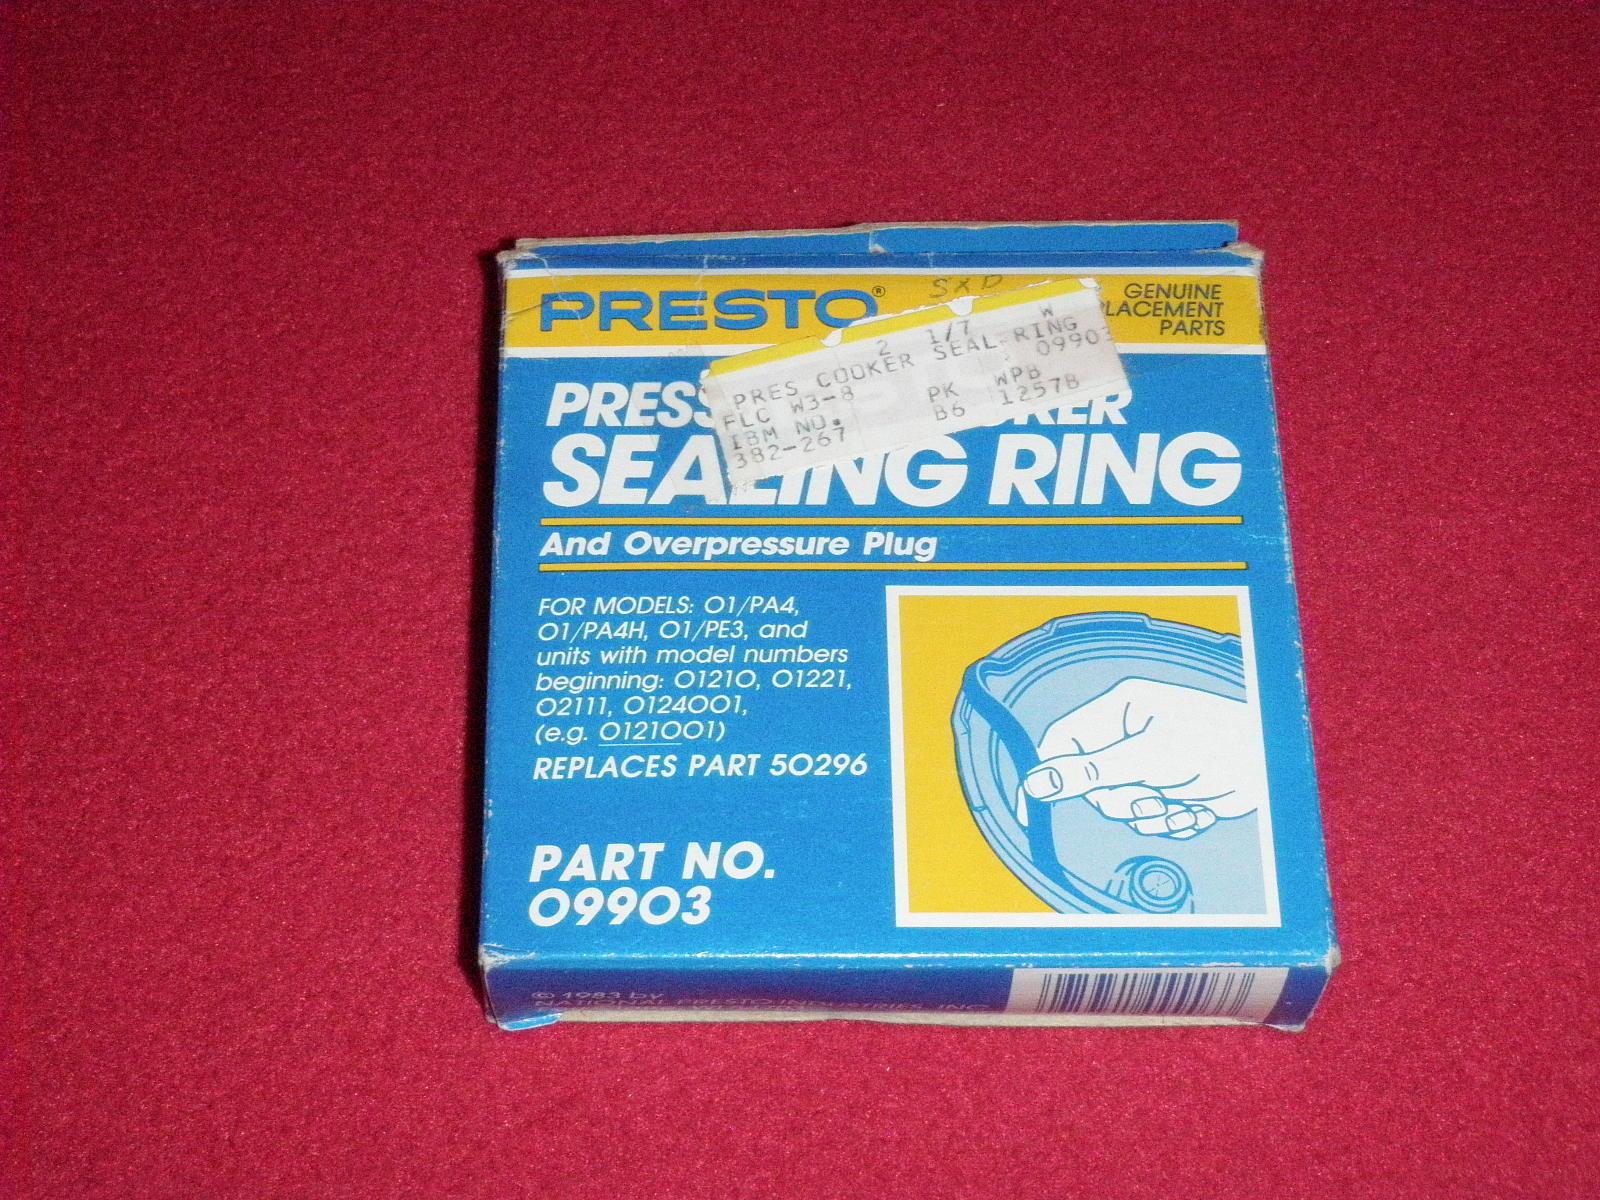 Presto Pressure Cooker Sealing Ring and similar items